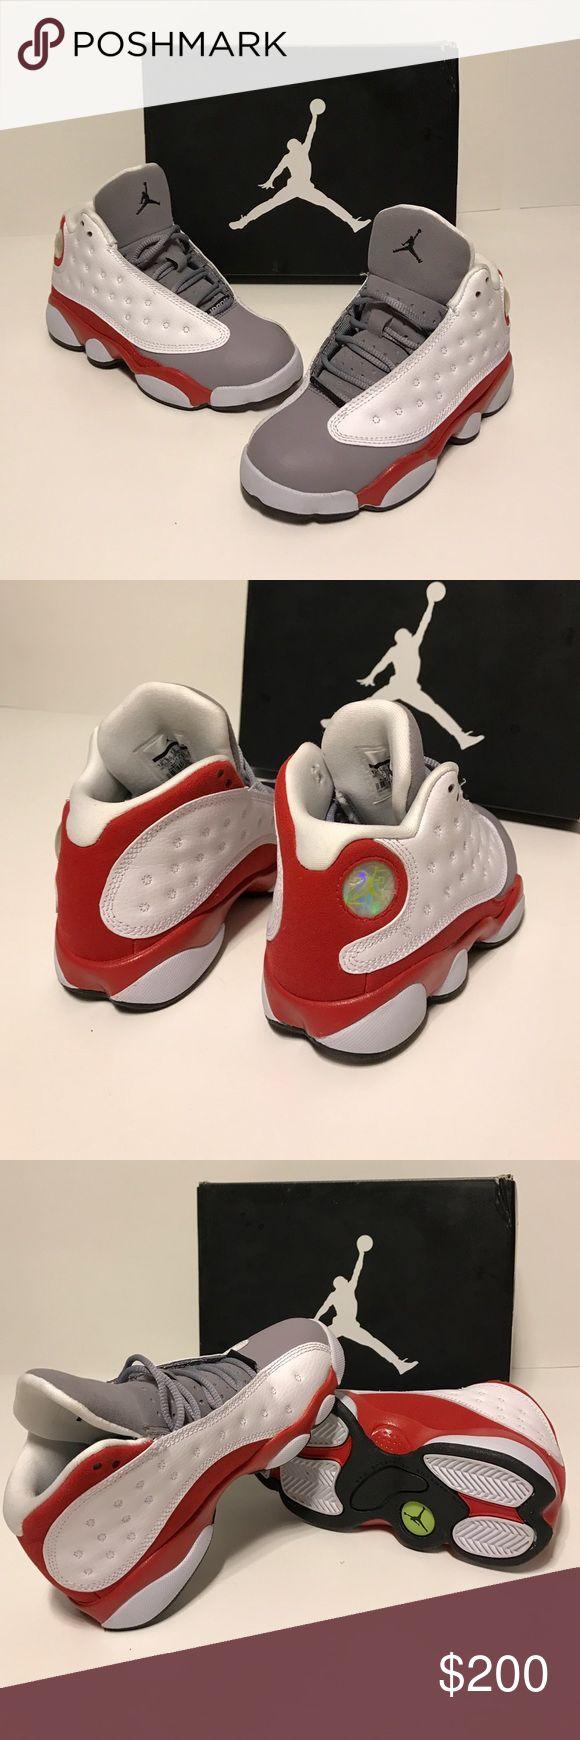 Jordan Retro 13 PS 12.5c